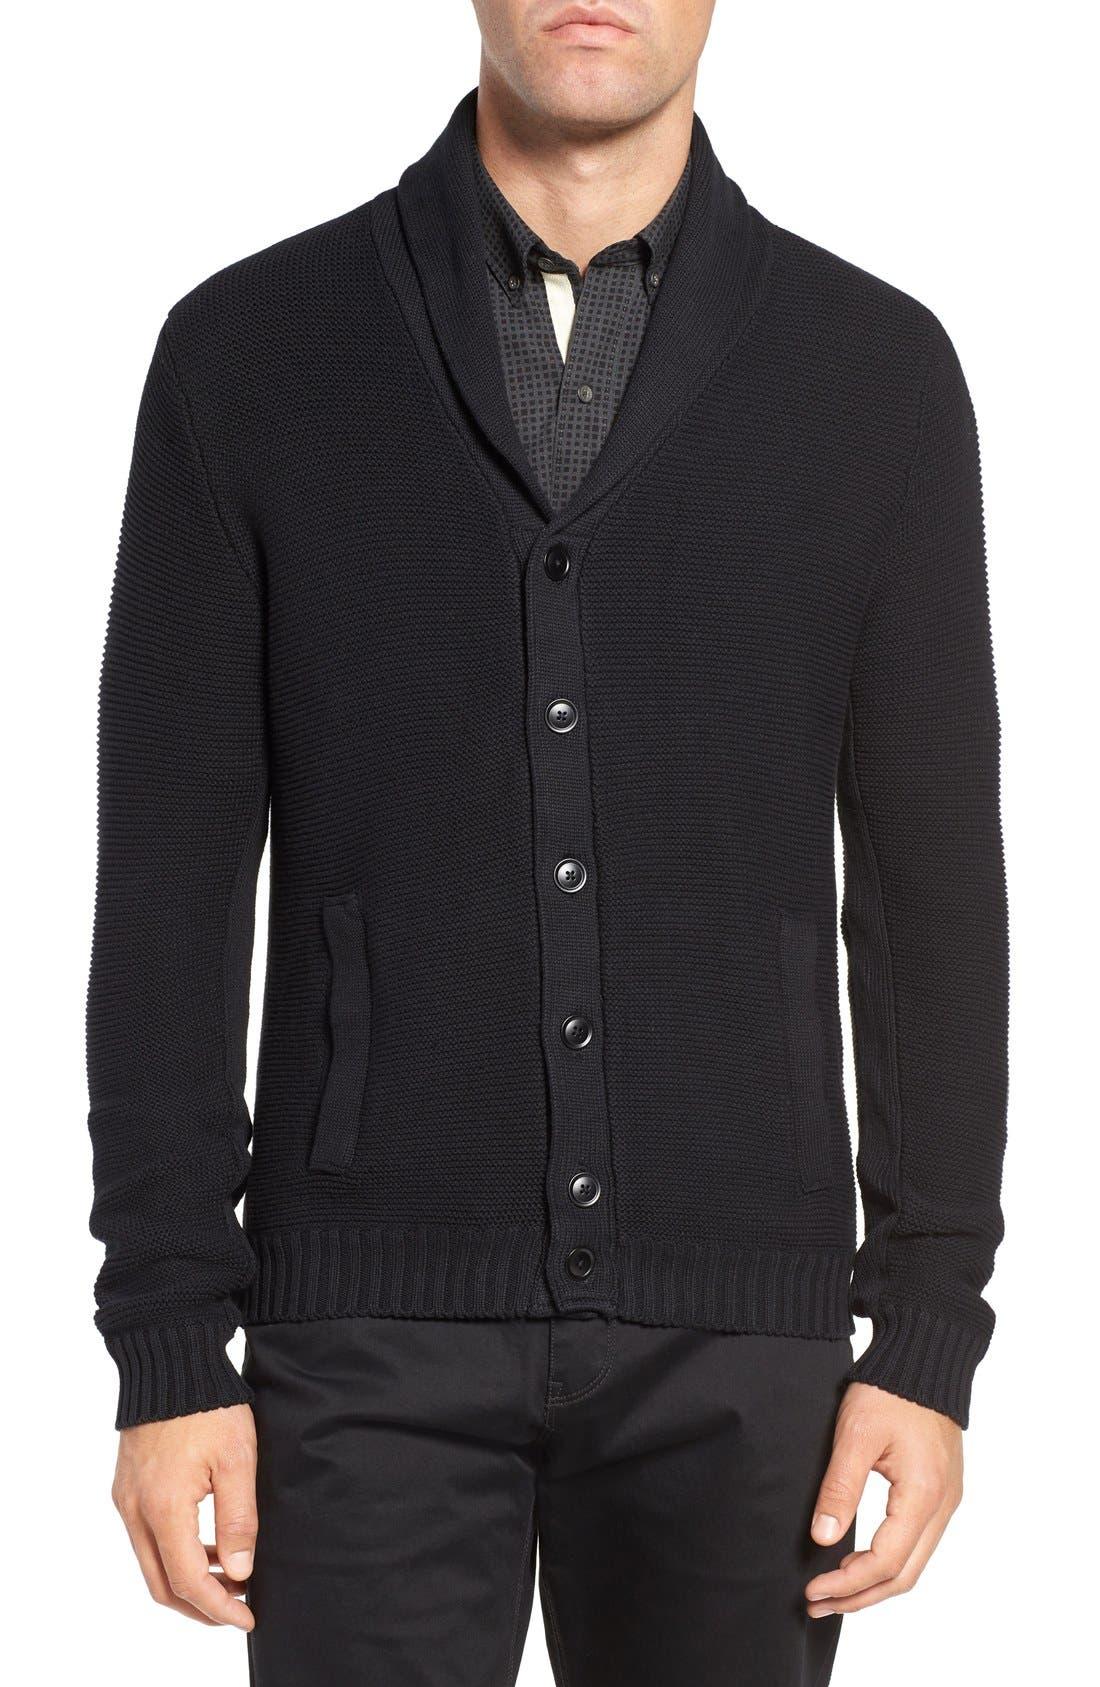 Cypress Cotton Shawl Collar Cardigan,                         Main,                         color,